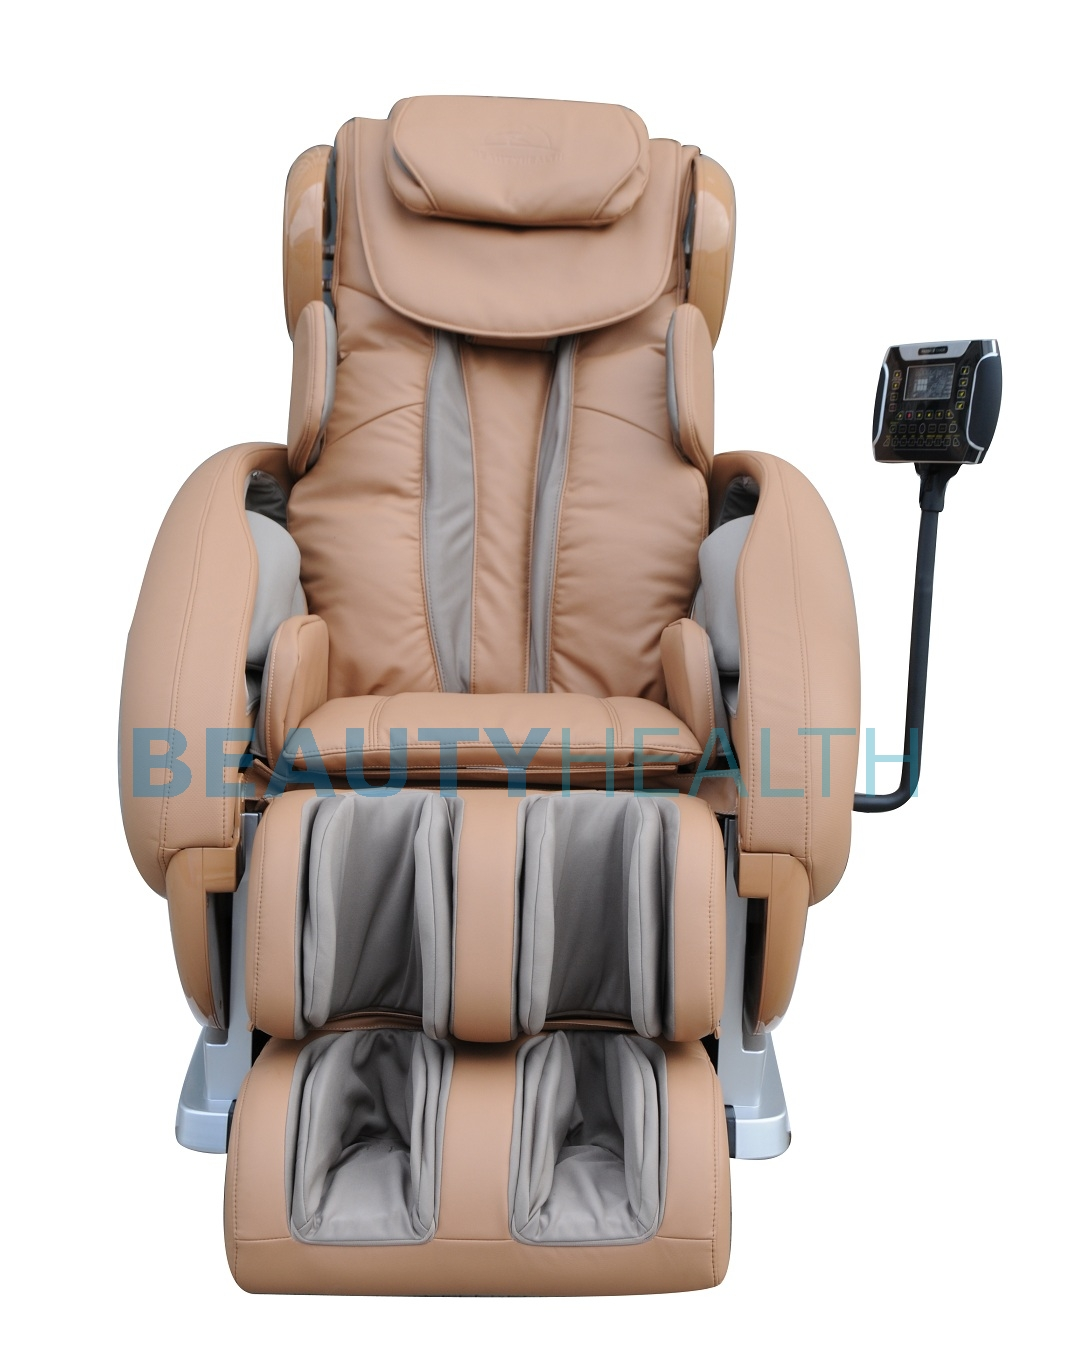 massage chairs for less childrens bouncy chair new beautyhealth bc supreme a zero gravity shiatsu